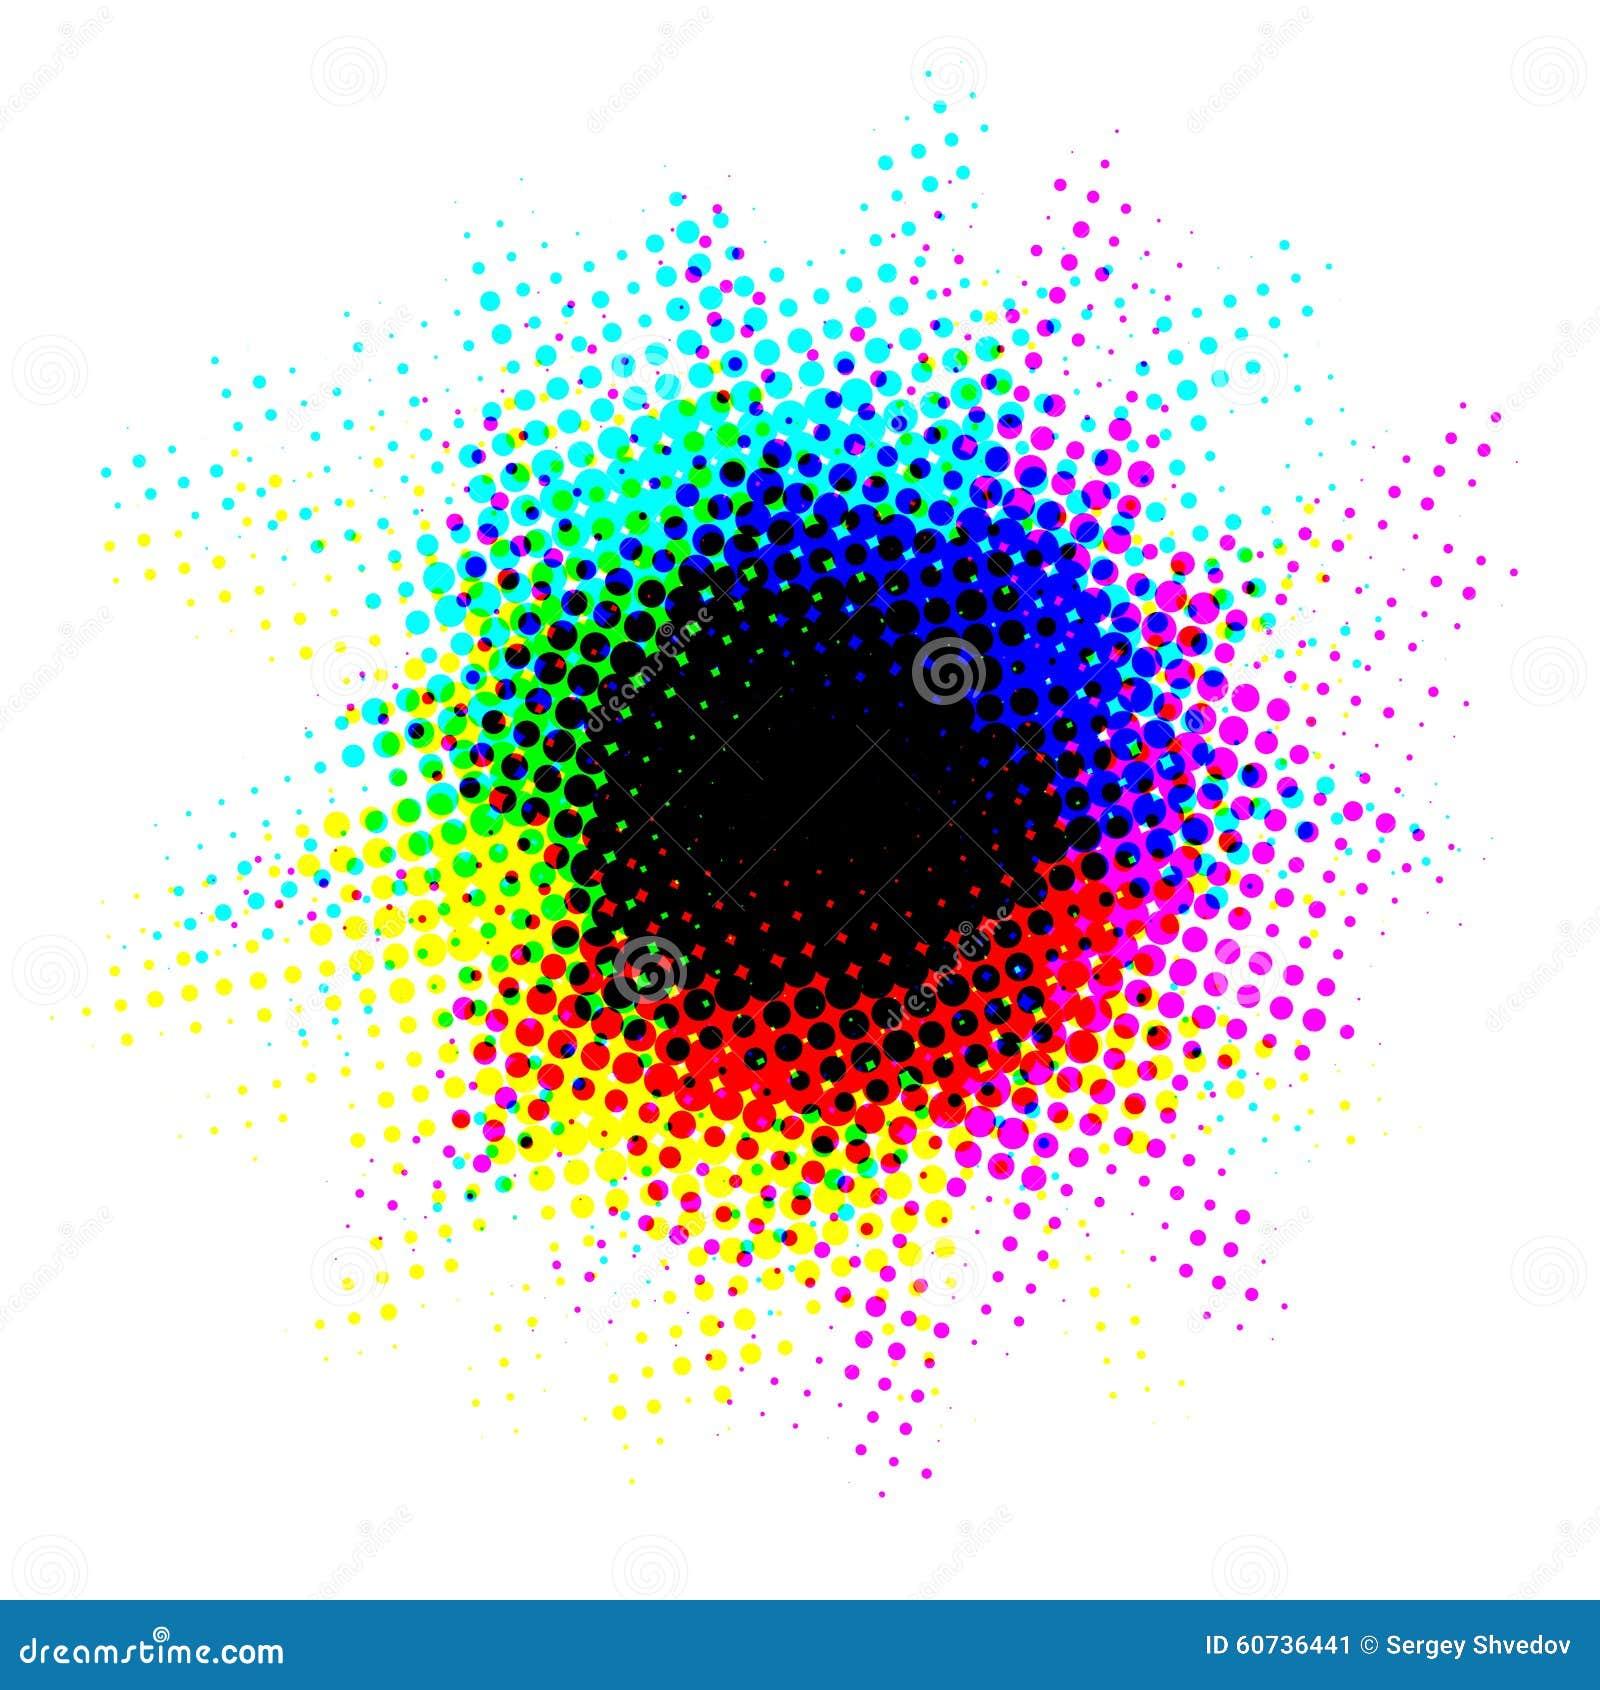 Multicolor halftone blot with dots